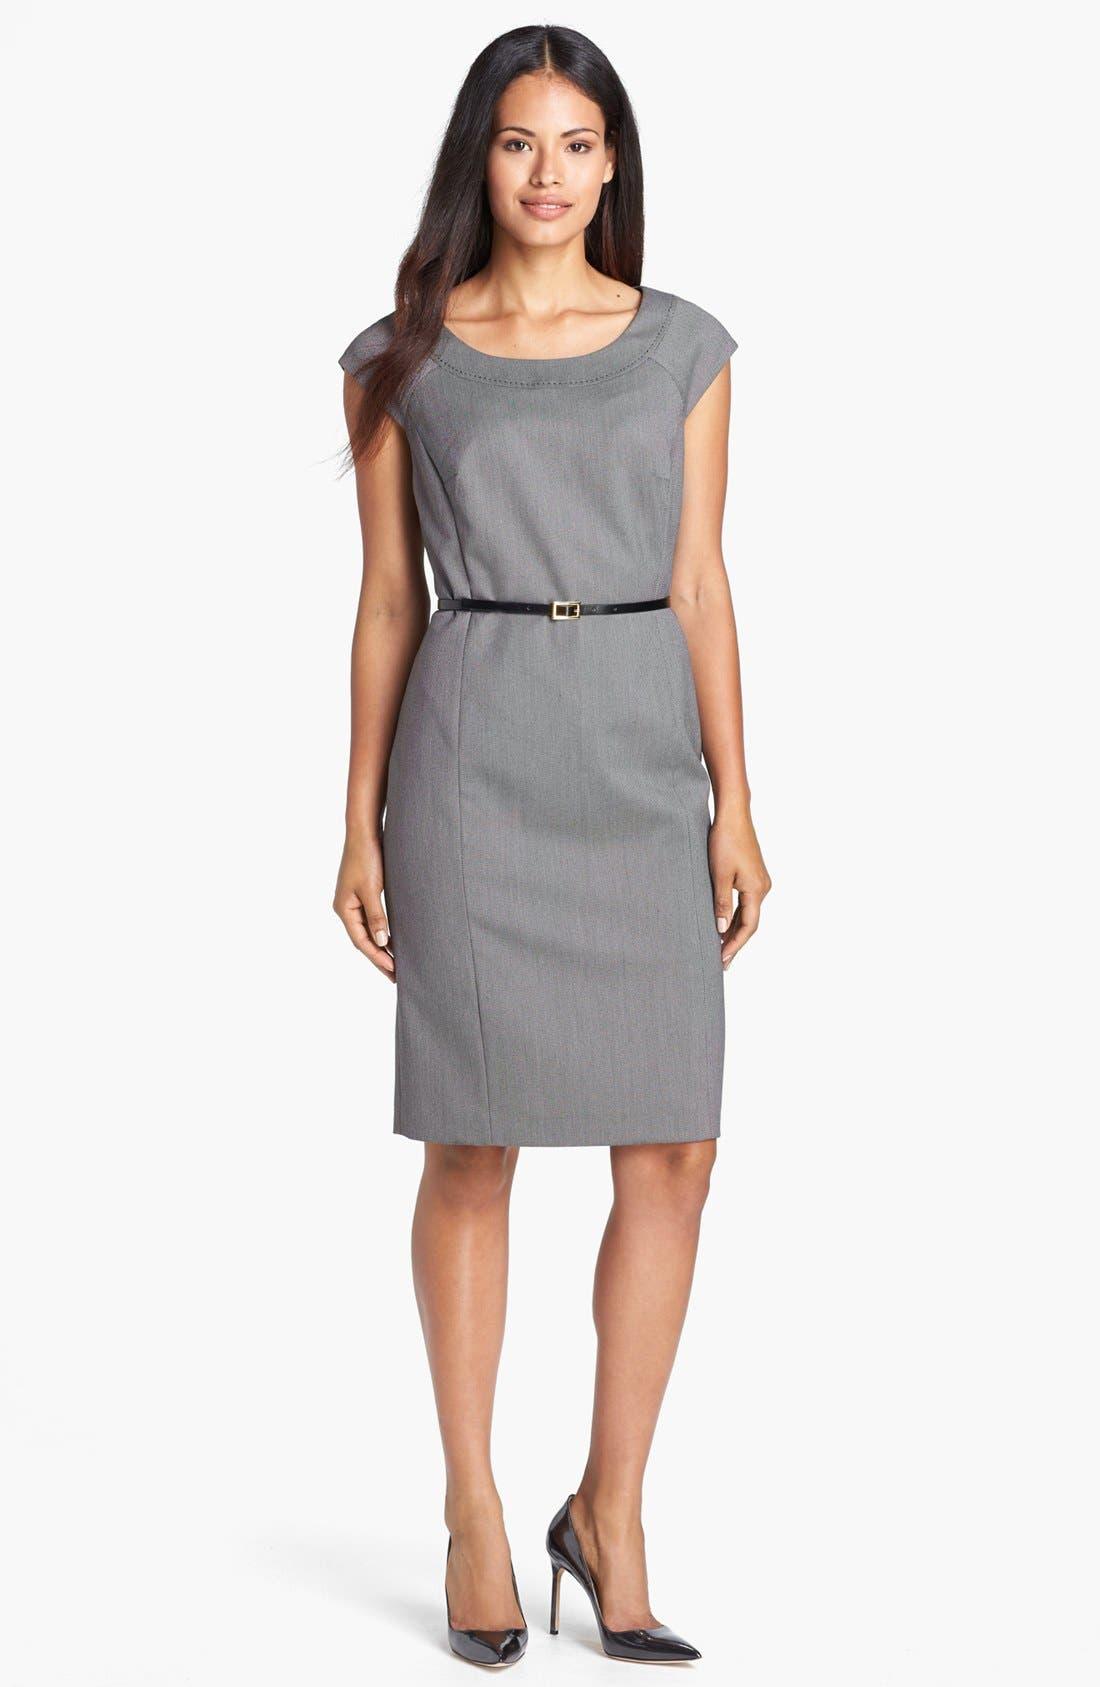 Main Image - Jones New York 'Brooke - Birdseye' Cap Sleeve Dress